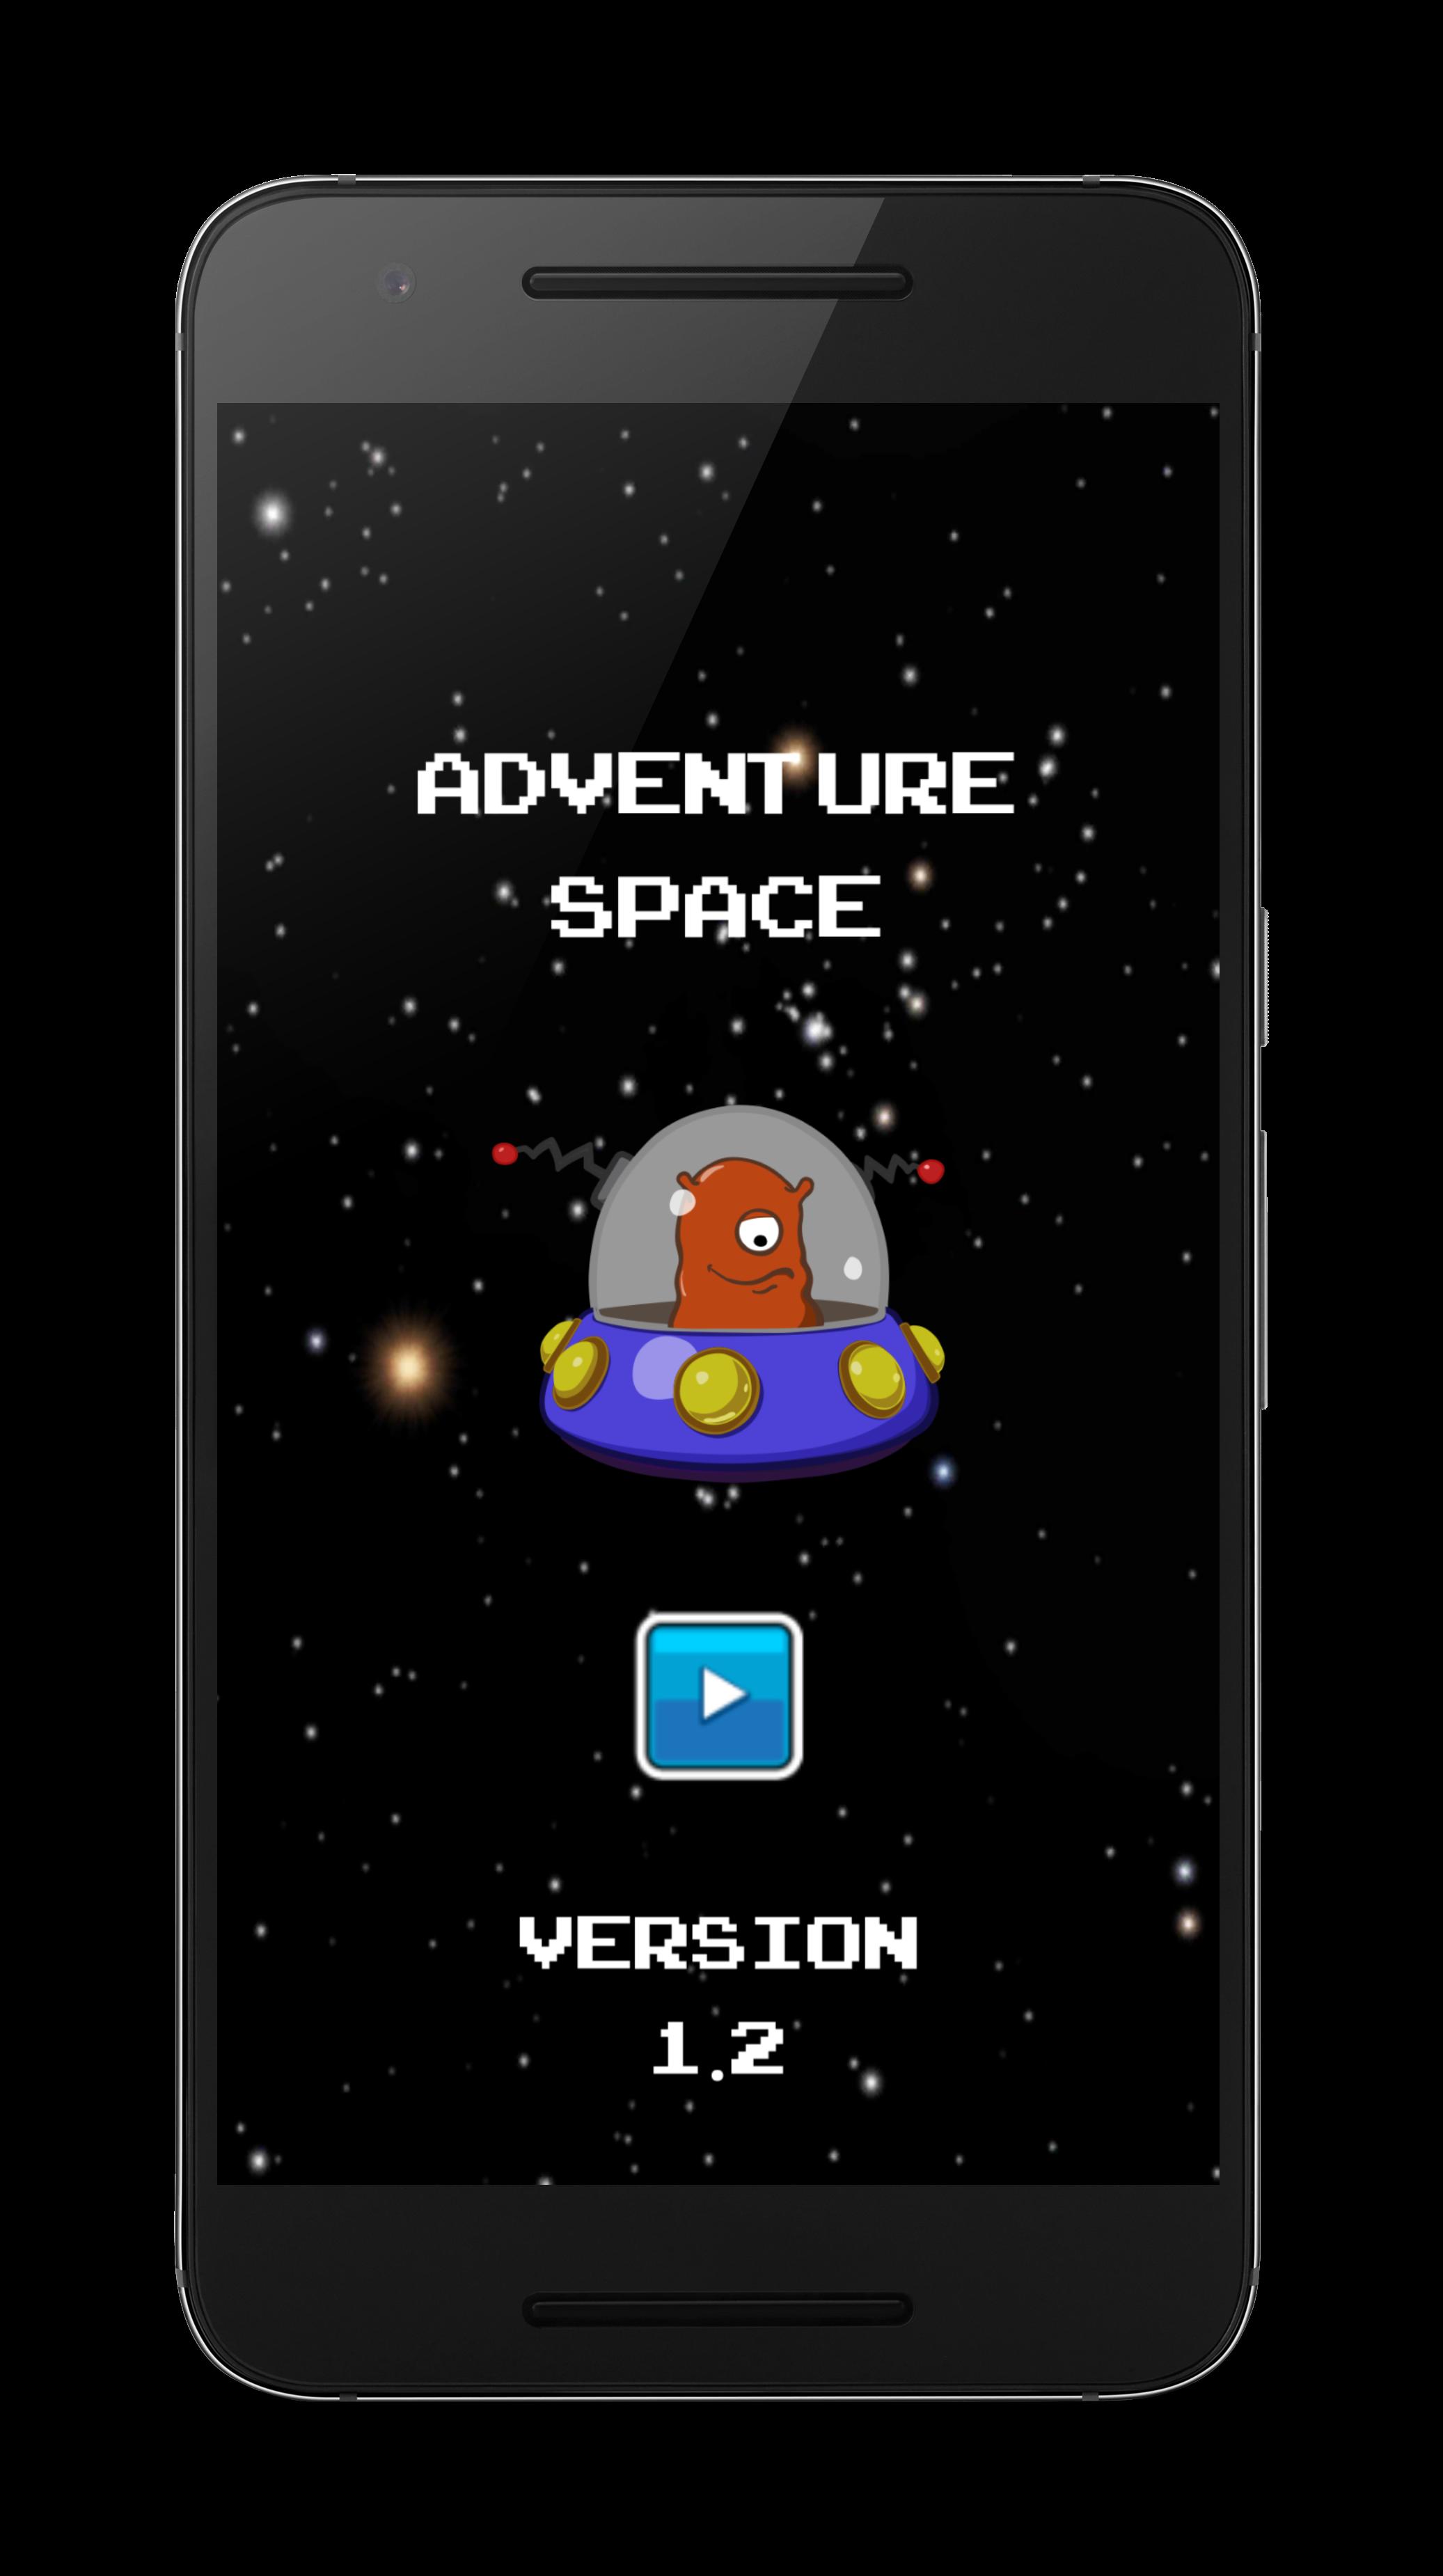 Adventure Space